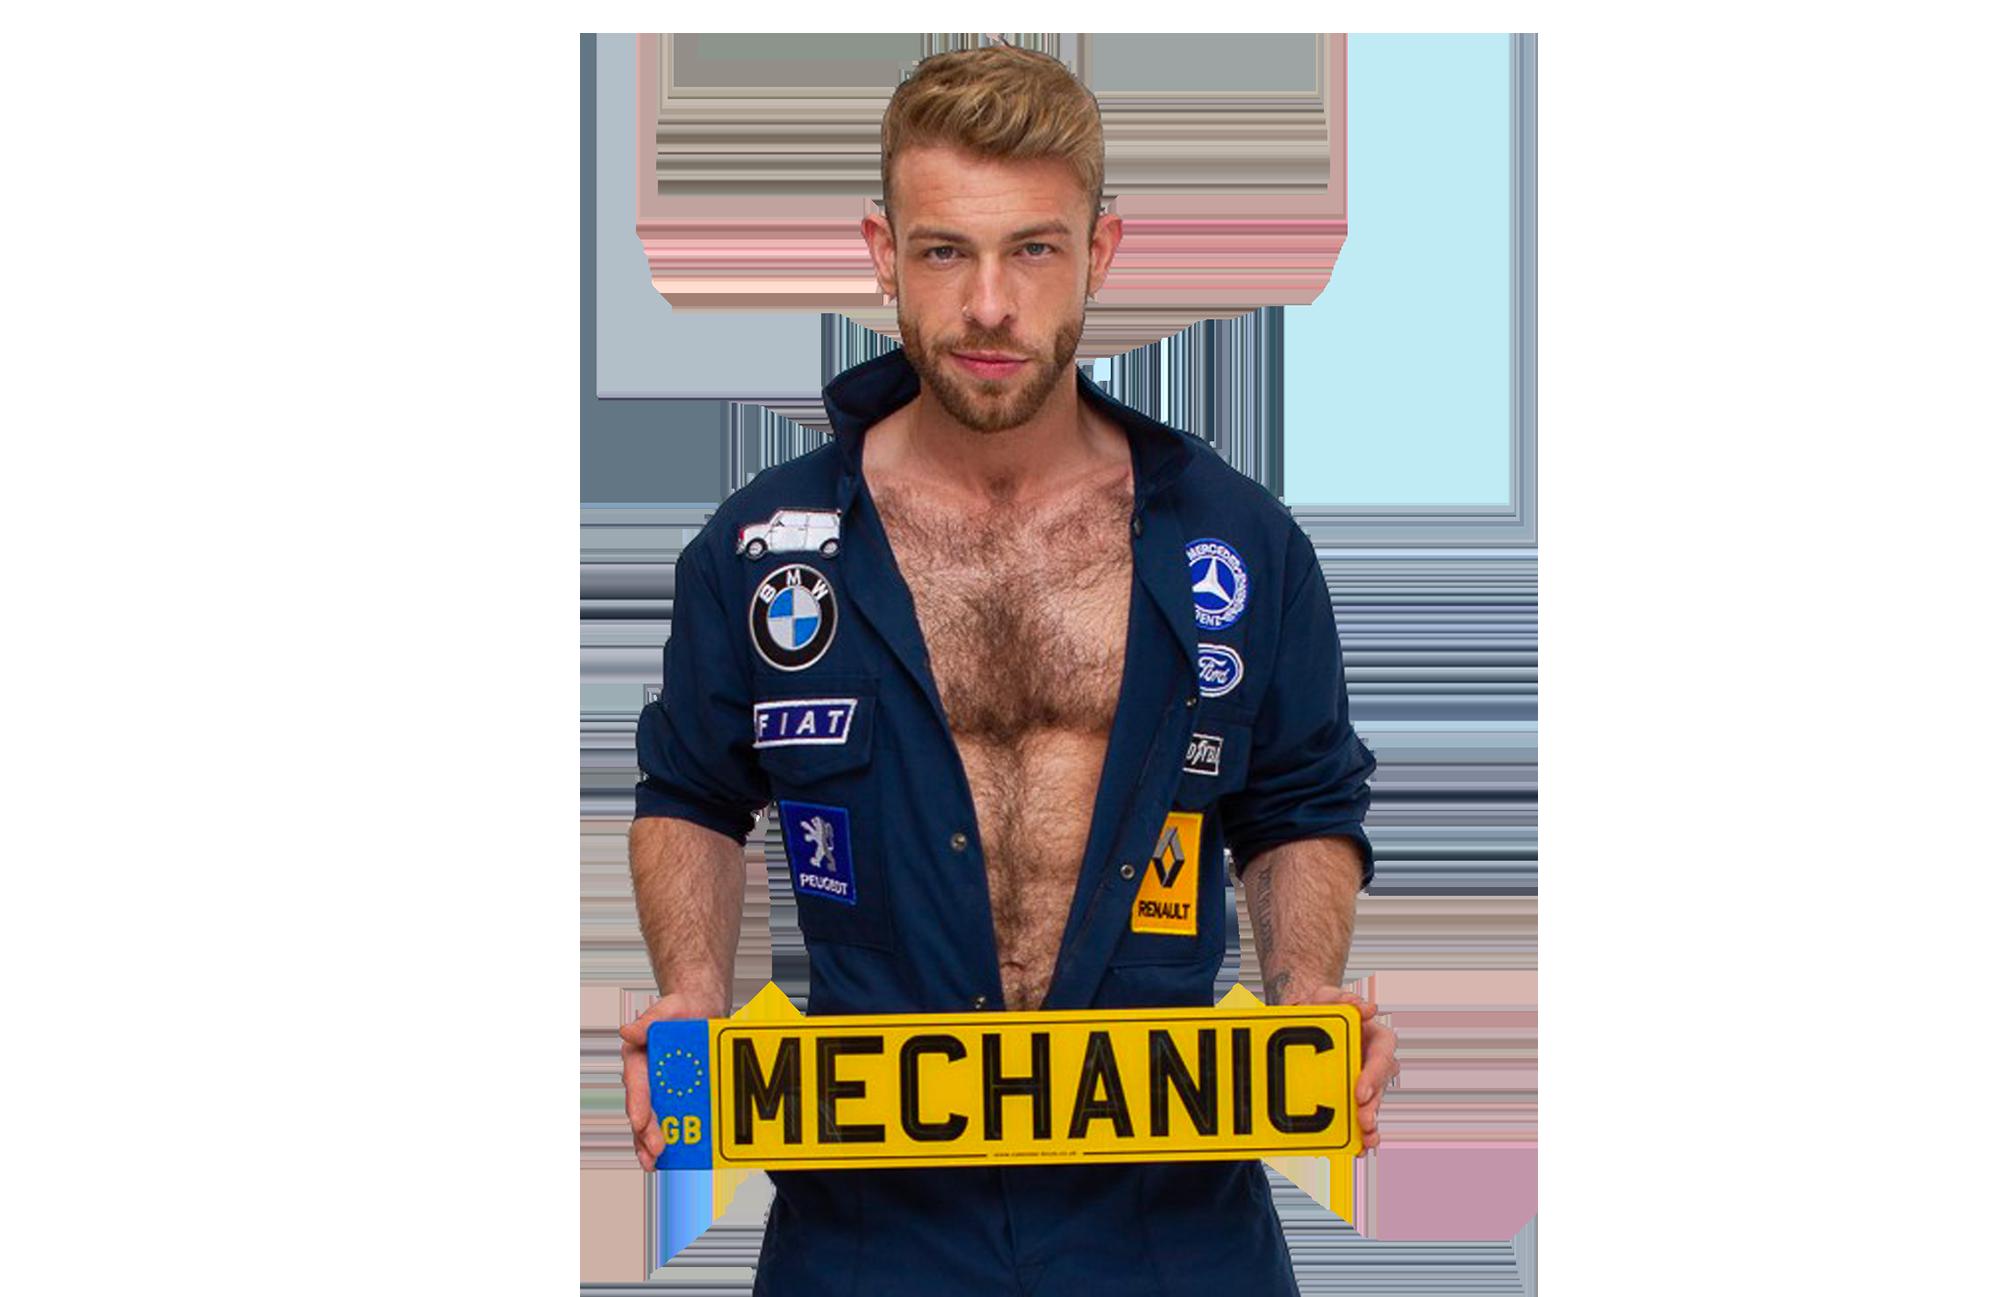 carousel-mechanic